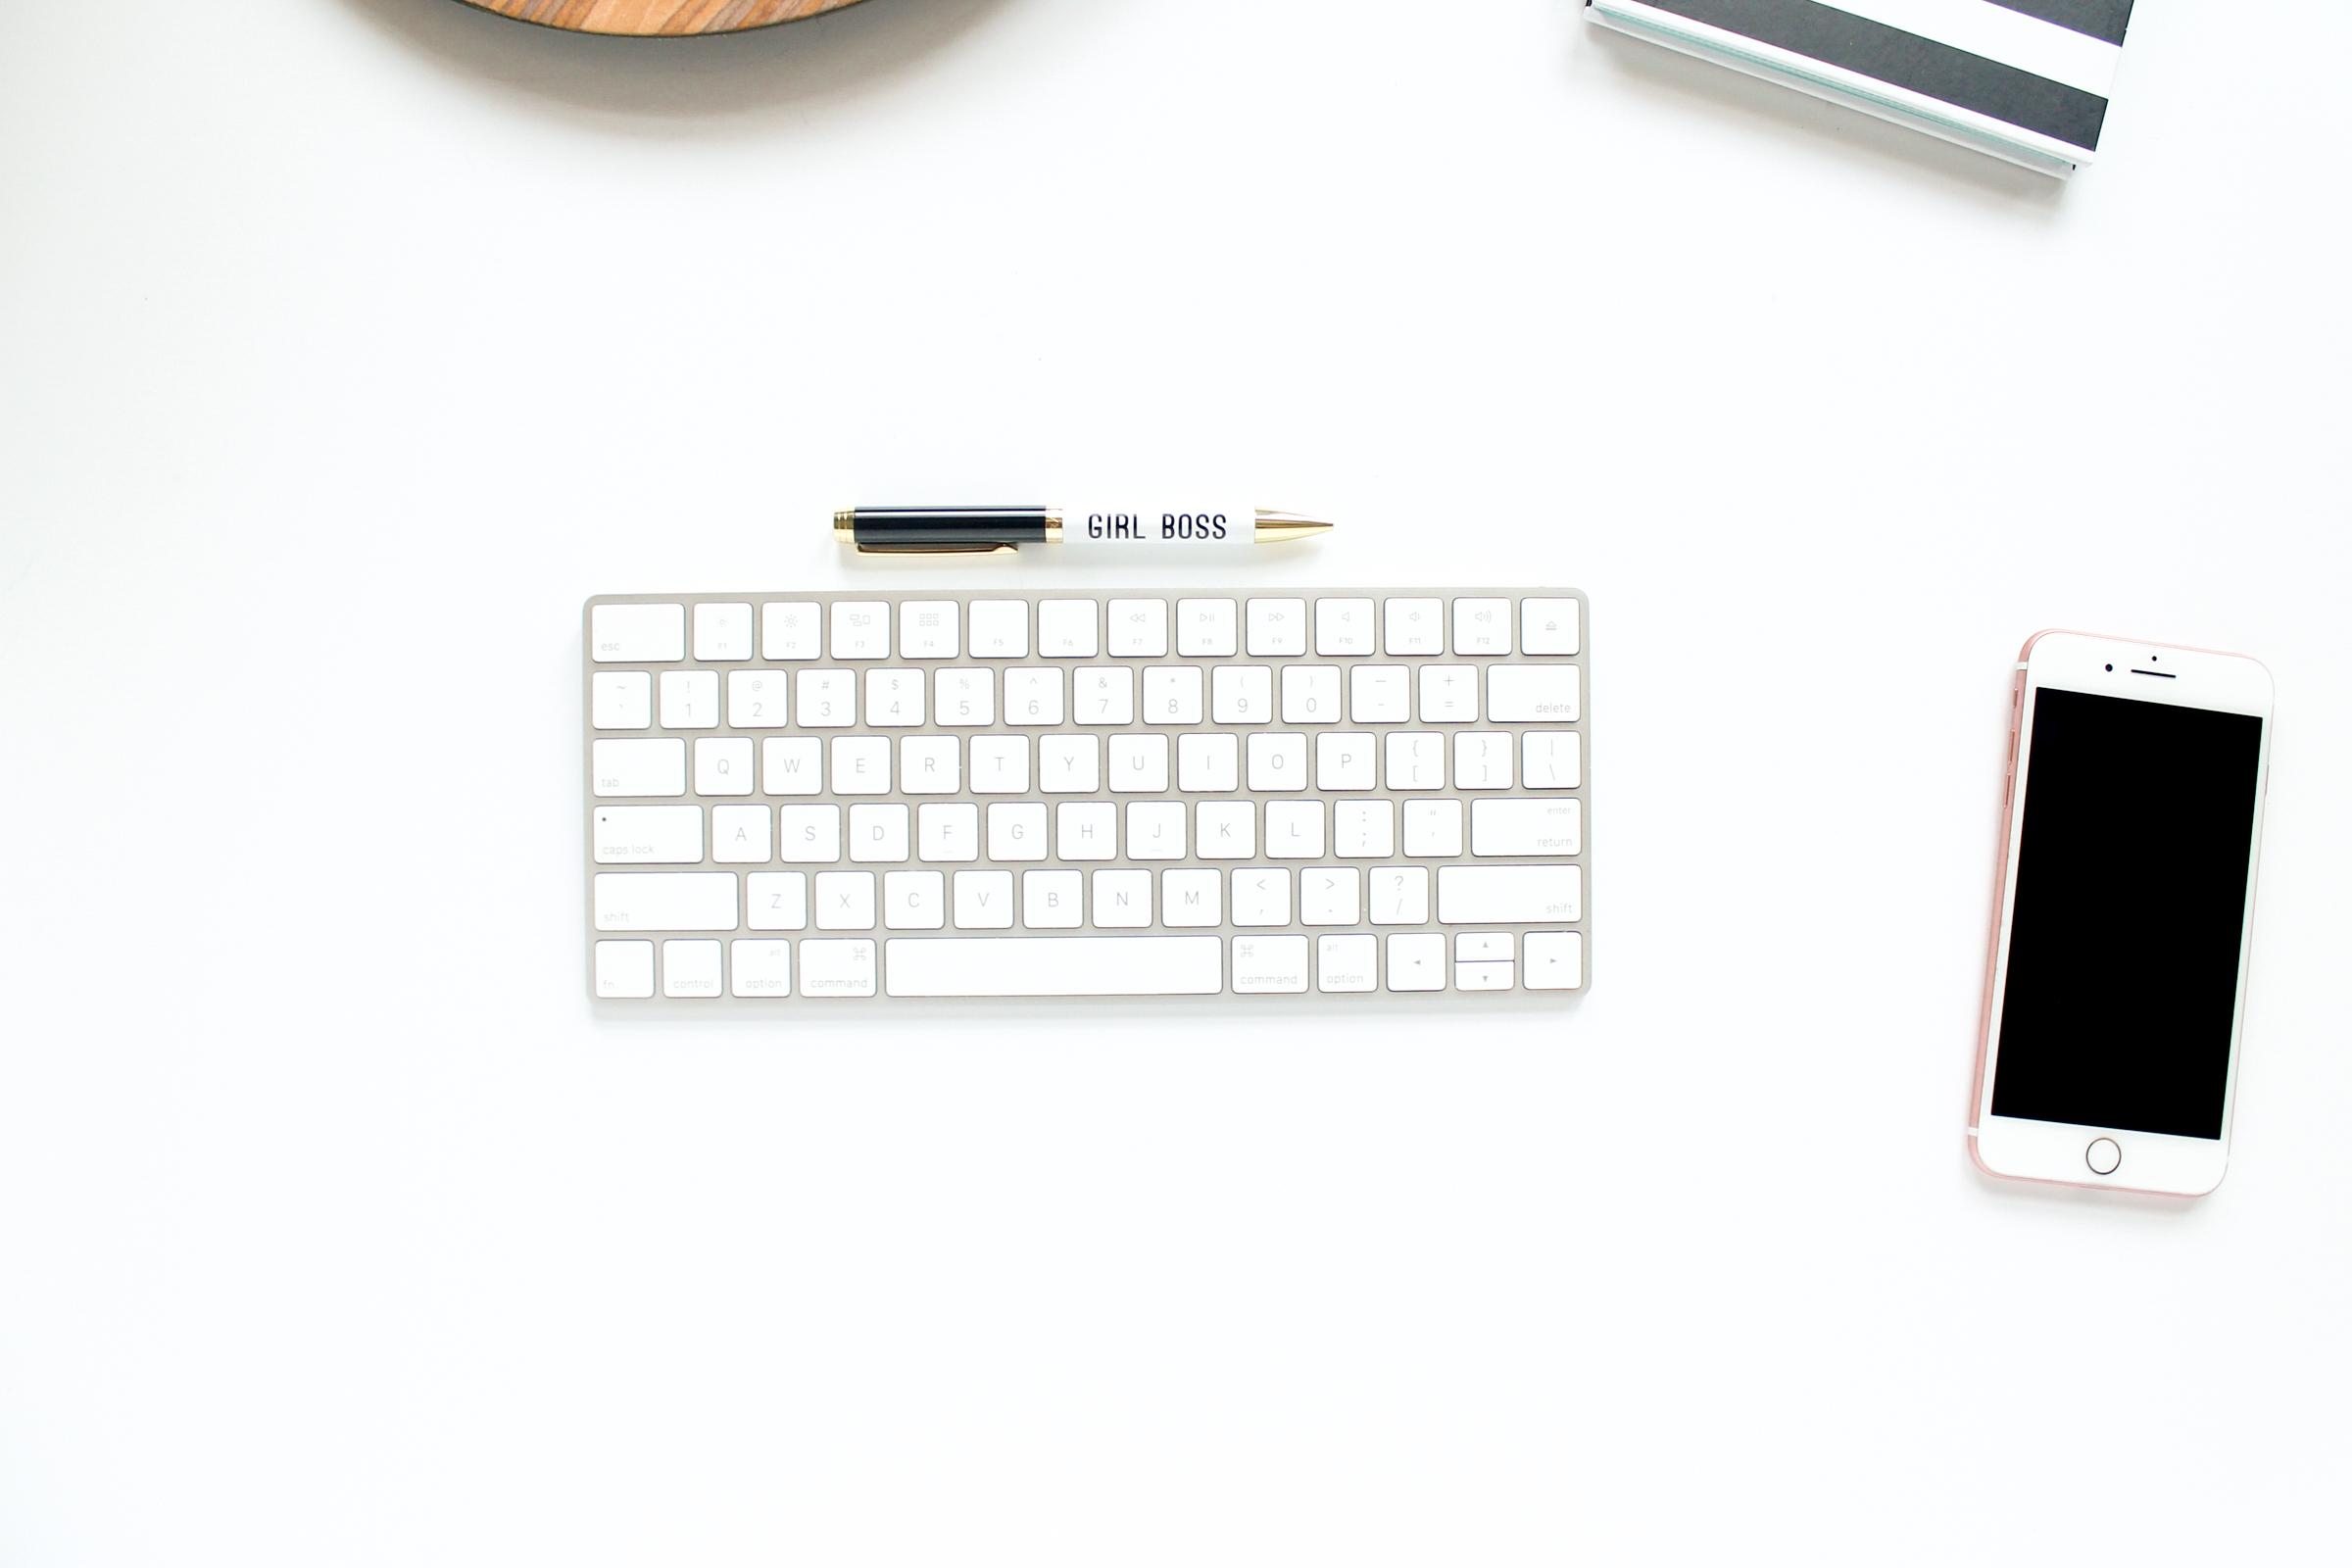 PBD Striped Desktop-14.jpg